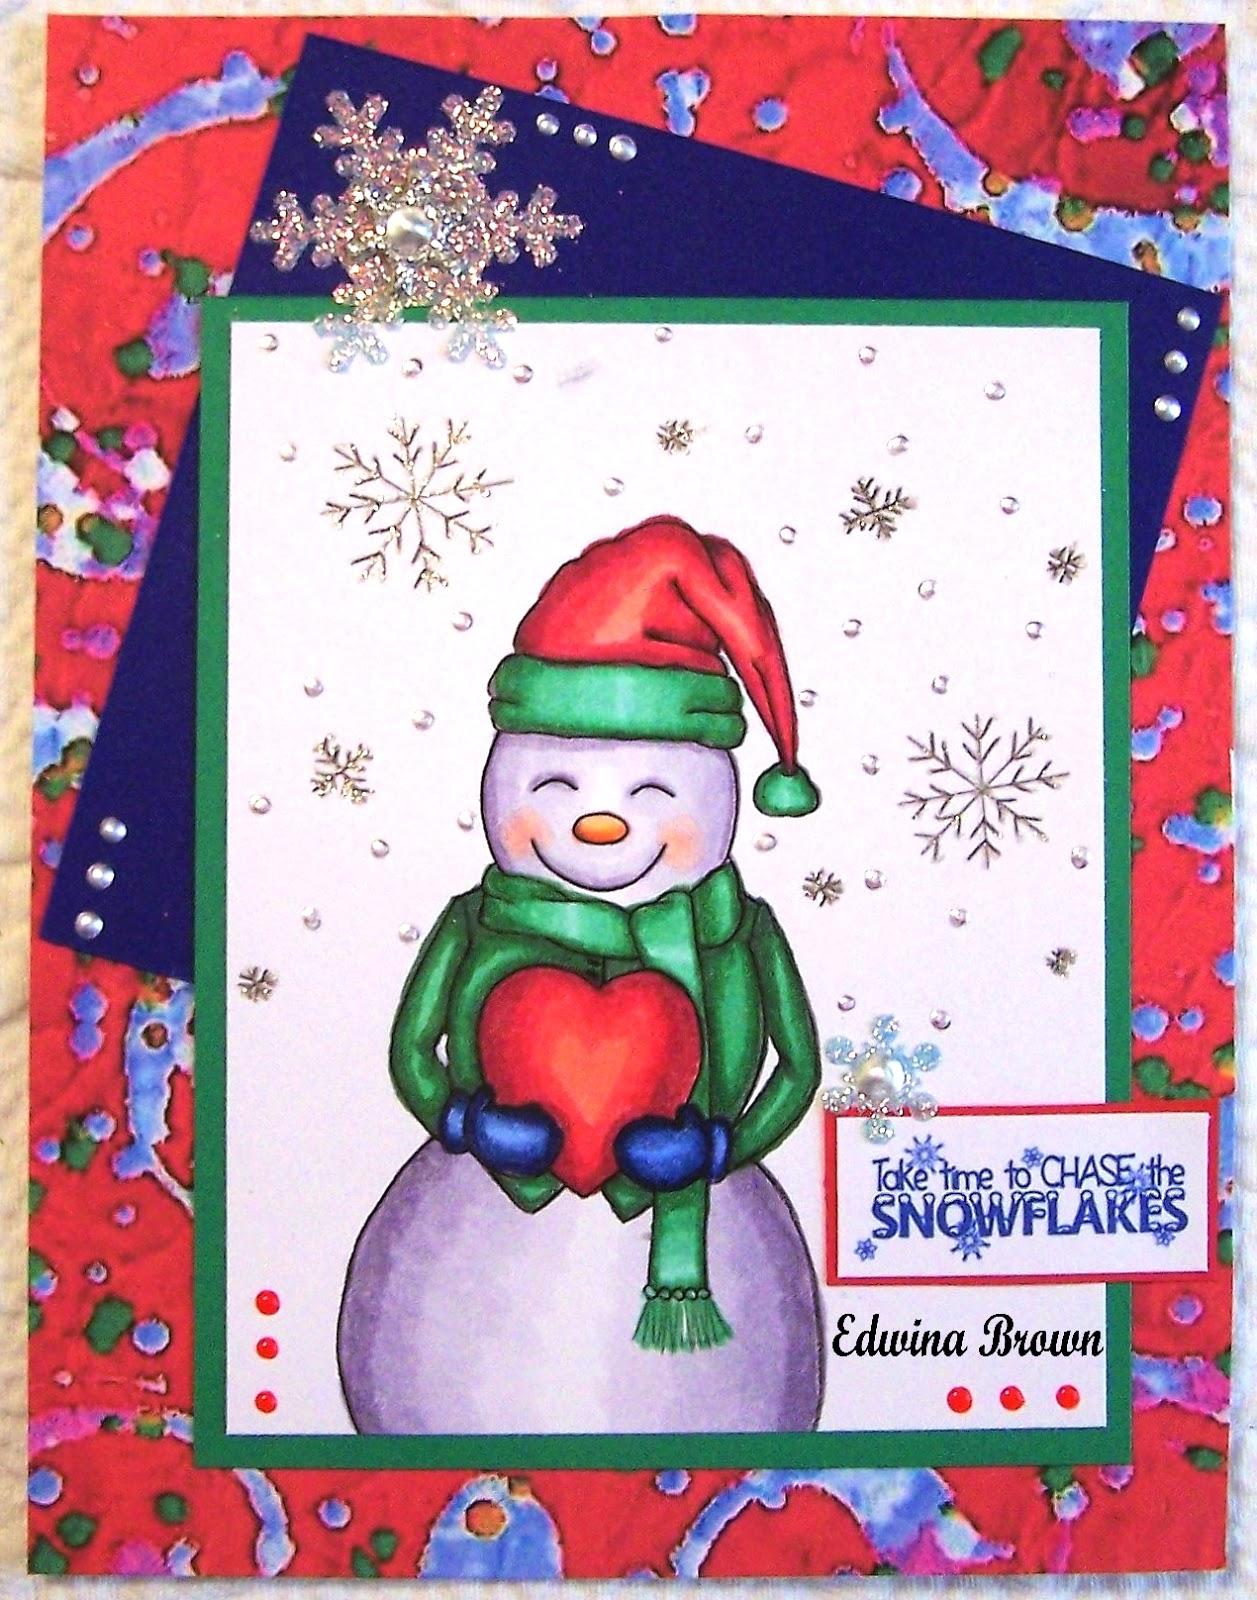 Copics used are BV0000, BV000, V22, R20, R30- snowman, YR01, YR04, YR09-  nose, G000, G02, G03, G07, G28, R22, R29, R35, R59, B32, B34, B37, B39-  outfit, ...